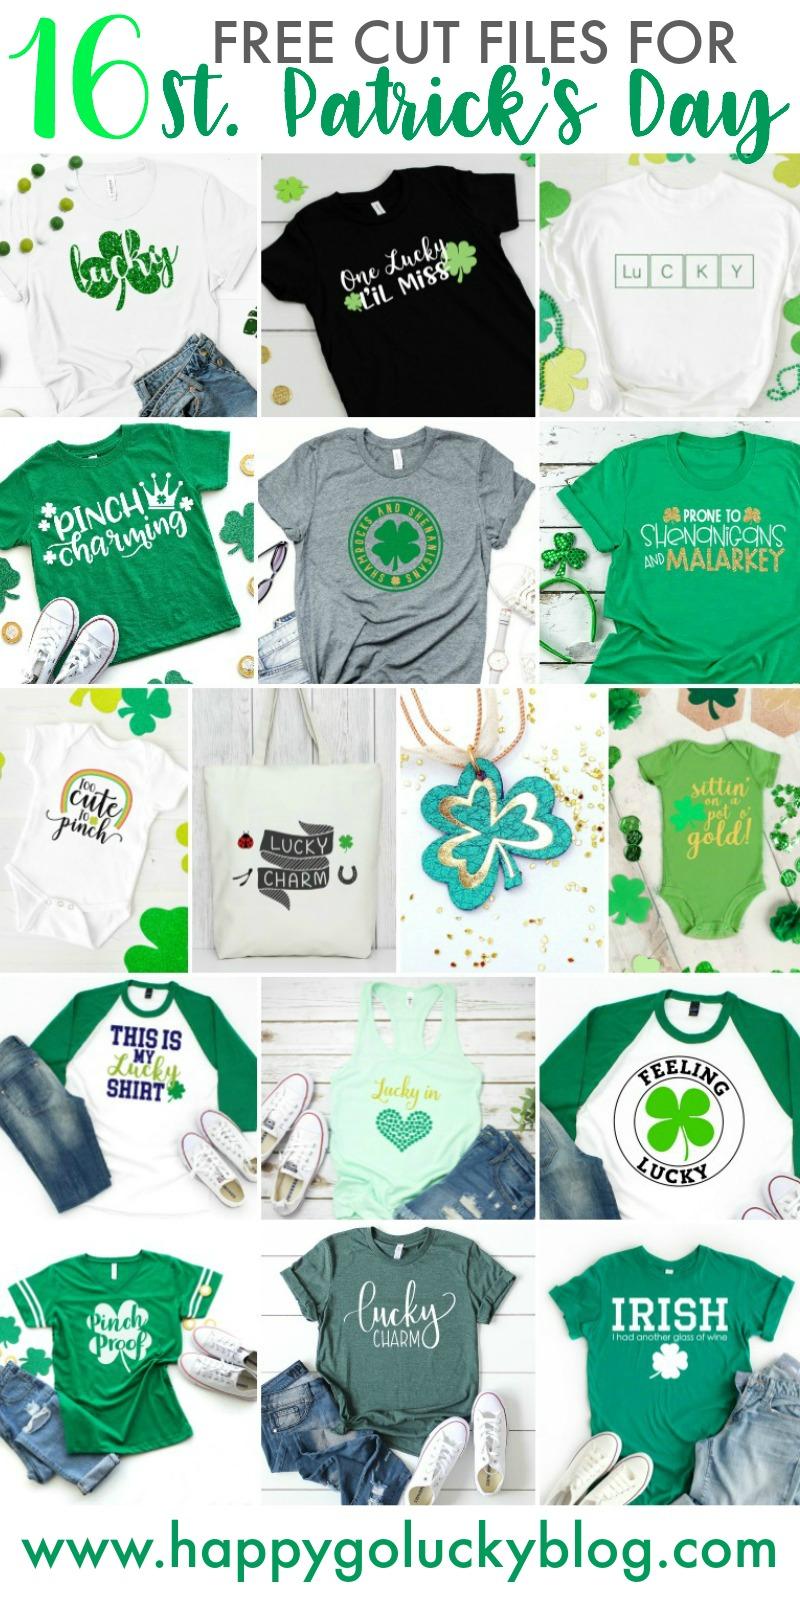 16 Free St. Patrick's Day Cut Files